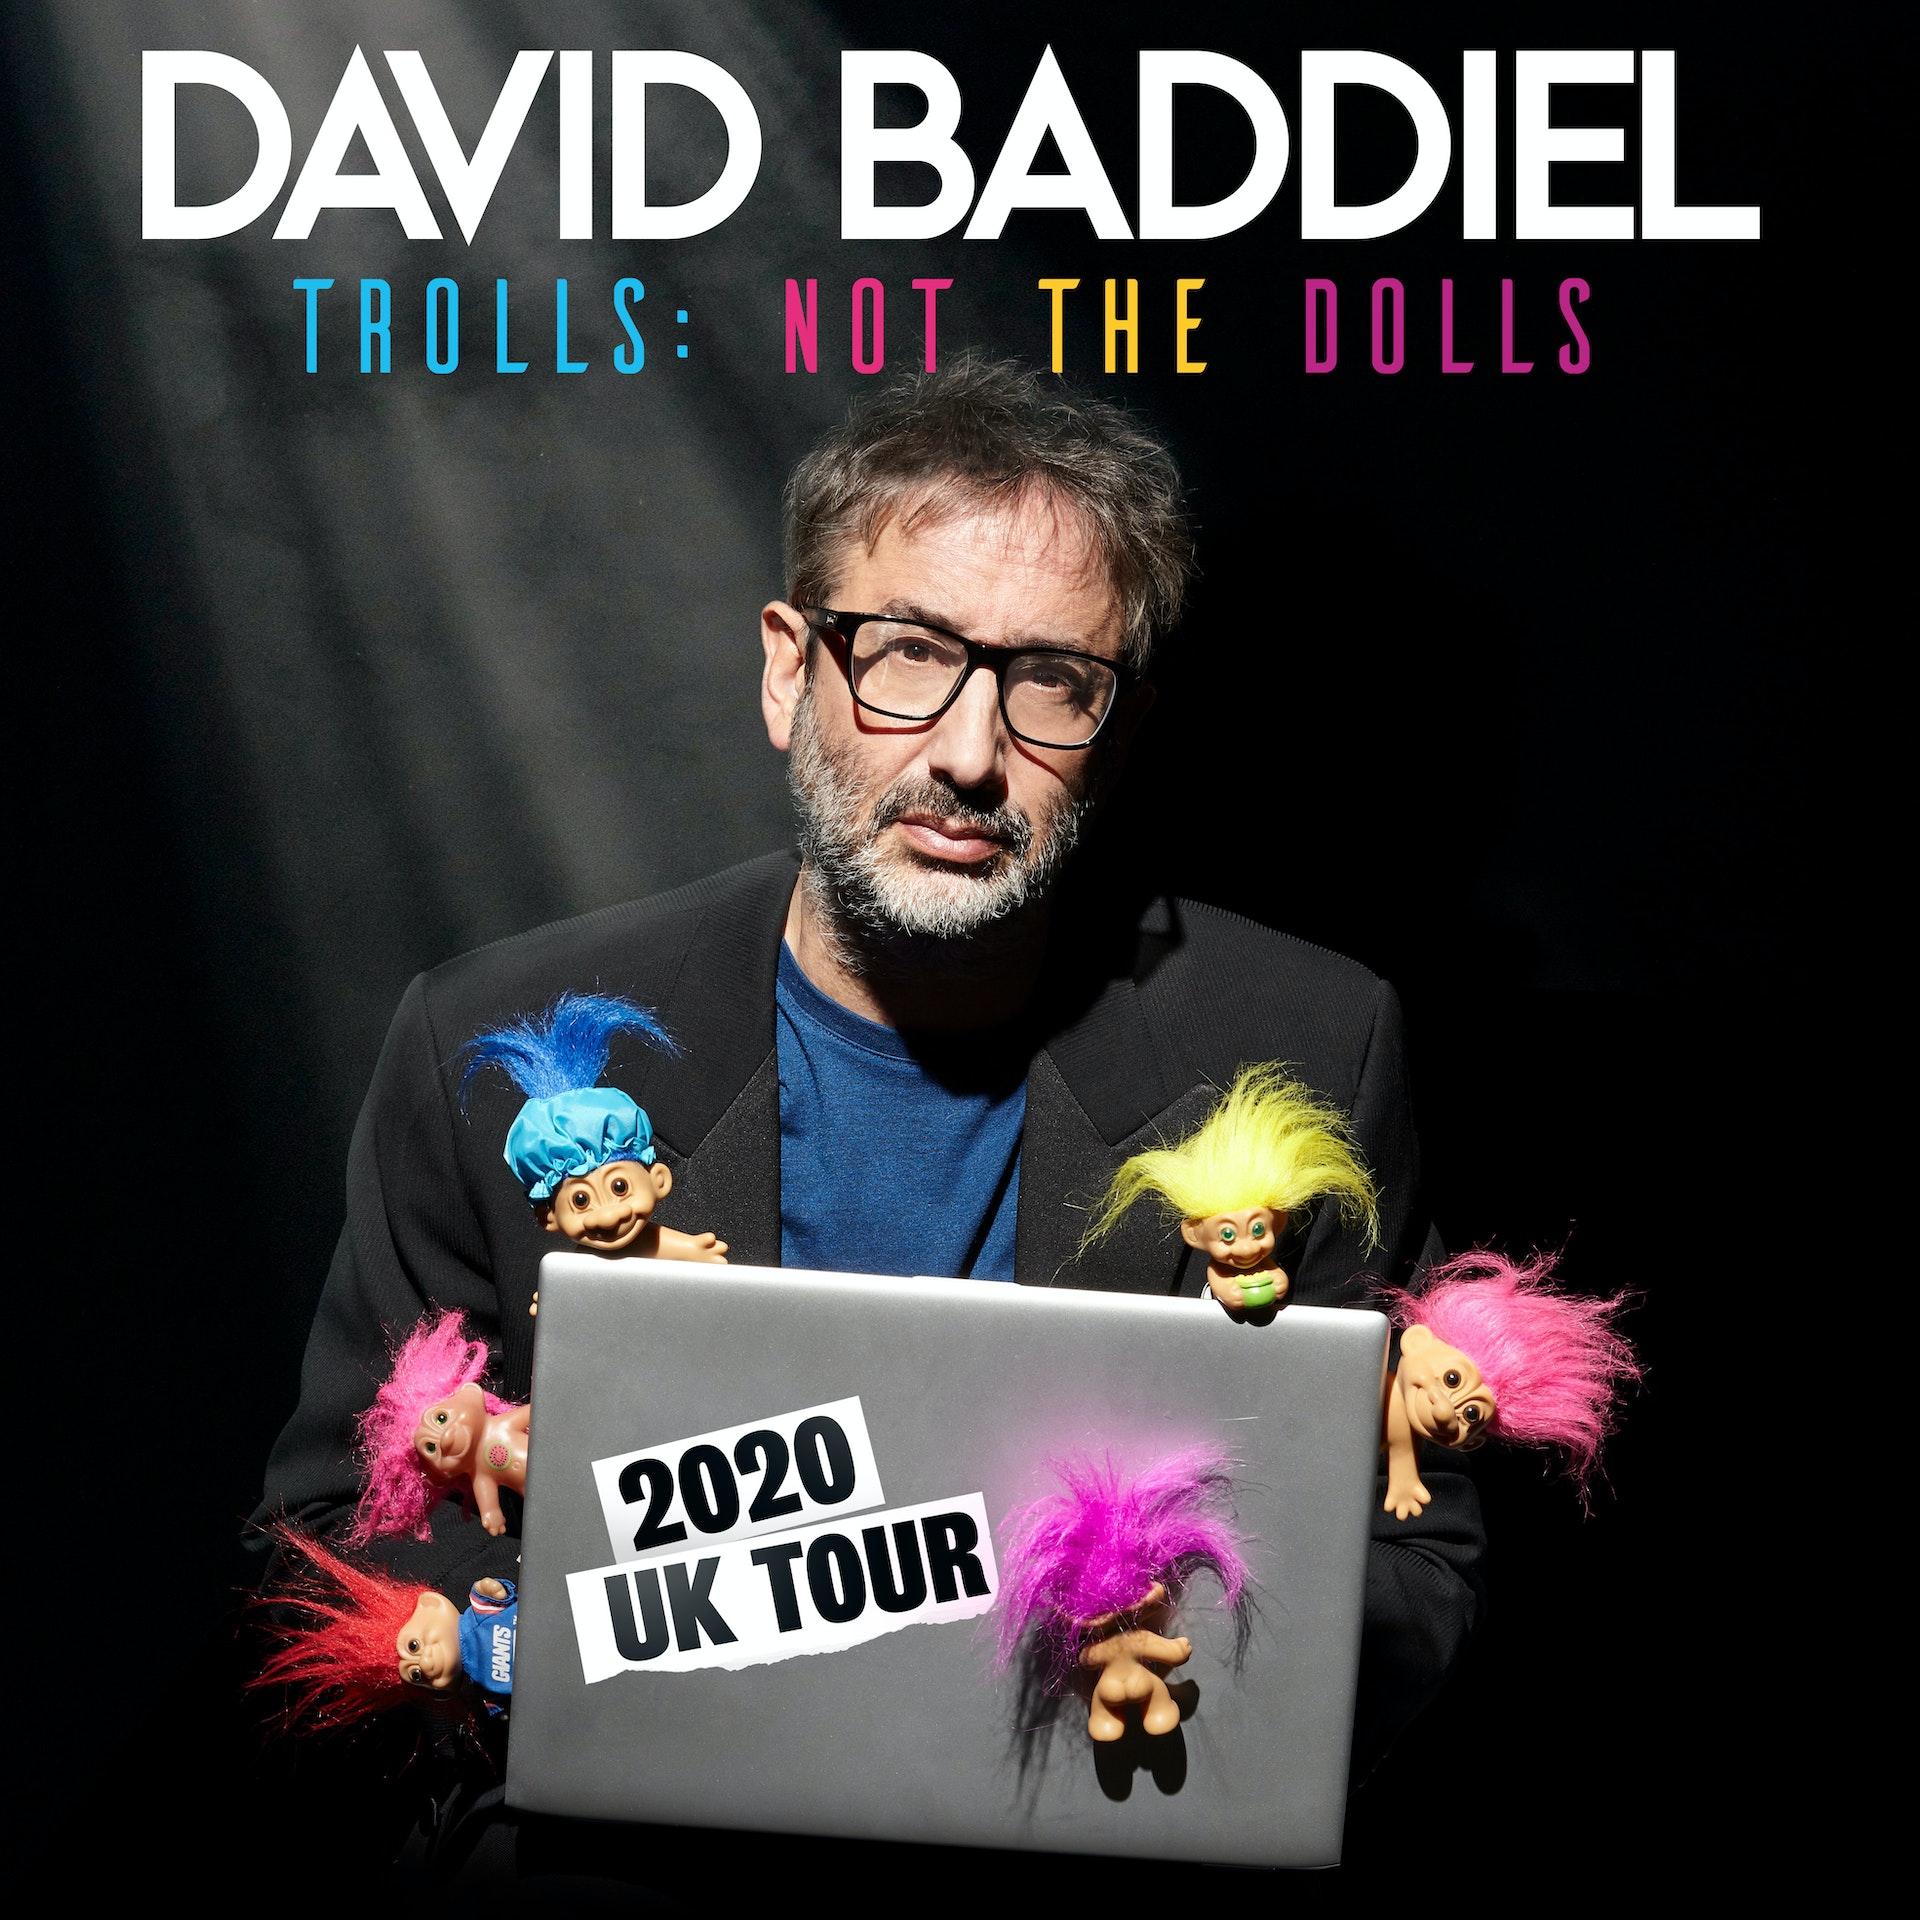 Beck Tour 2020.David Baddiel Hayes Tickets Beck Theatre 12th Mar 2020